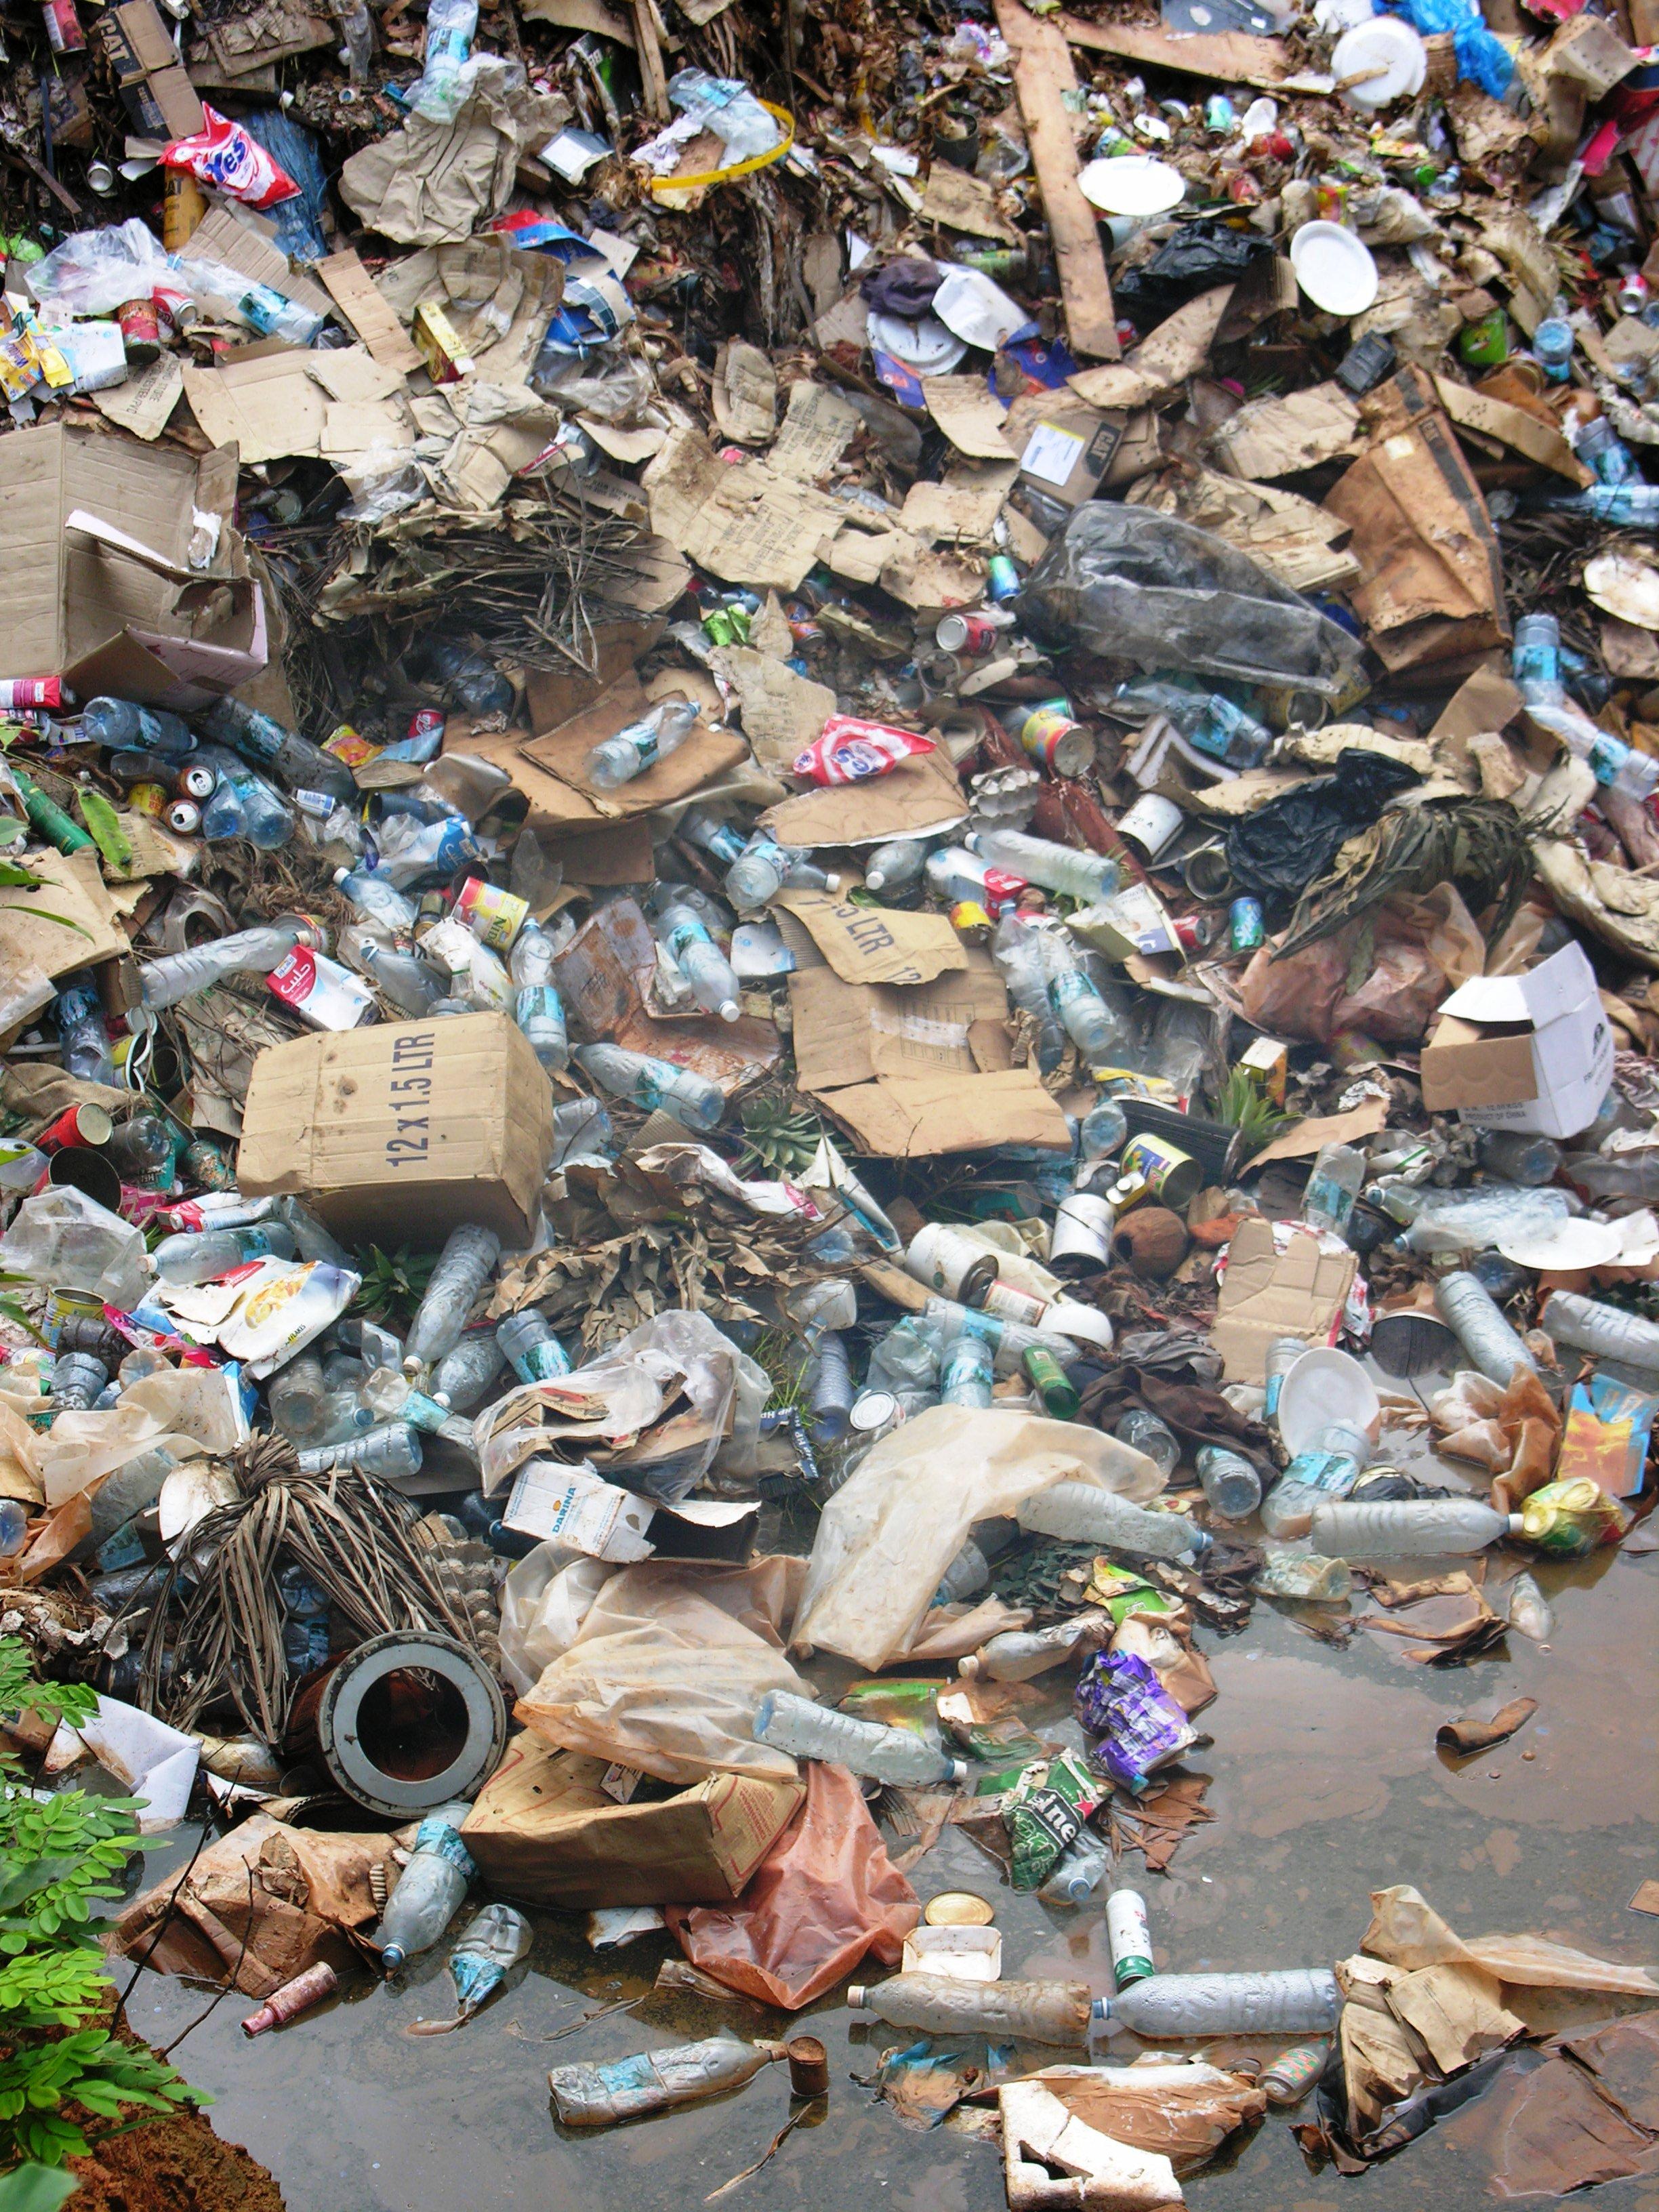 non-compliant waste disposal